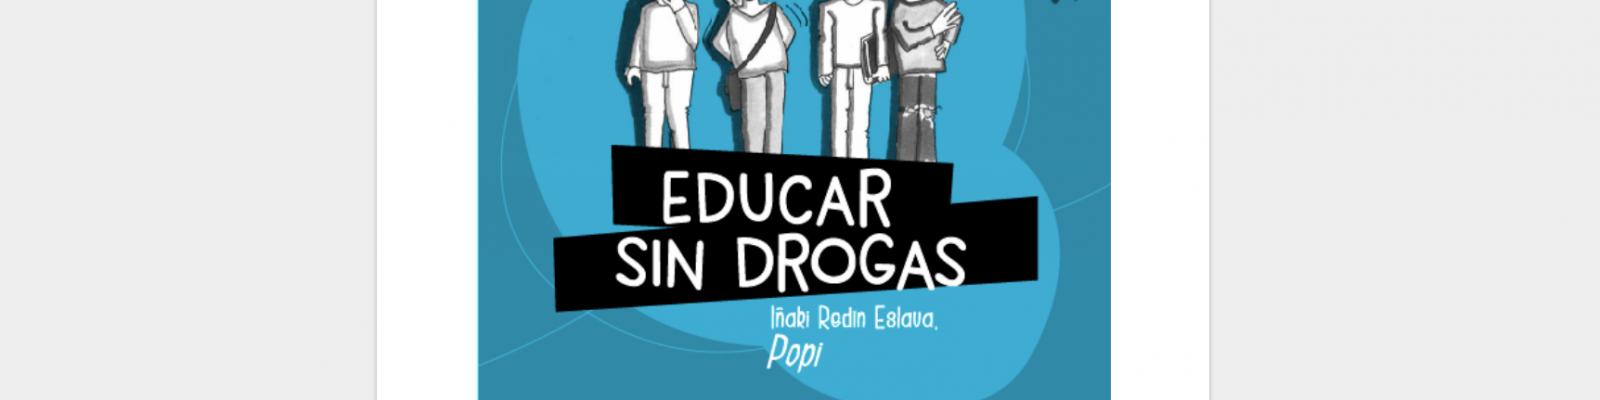 JORNADAS DE REFLEXIÓN PARA FAMILIAS: PROYECTO EDUCAR SIN DROGAS